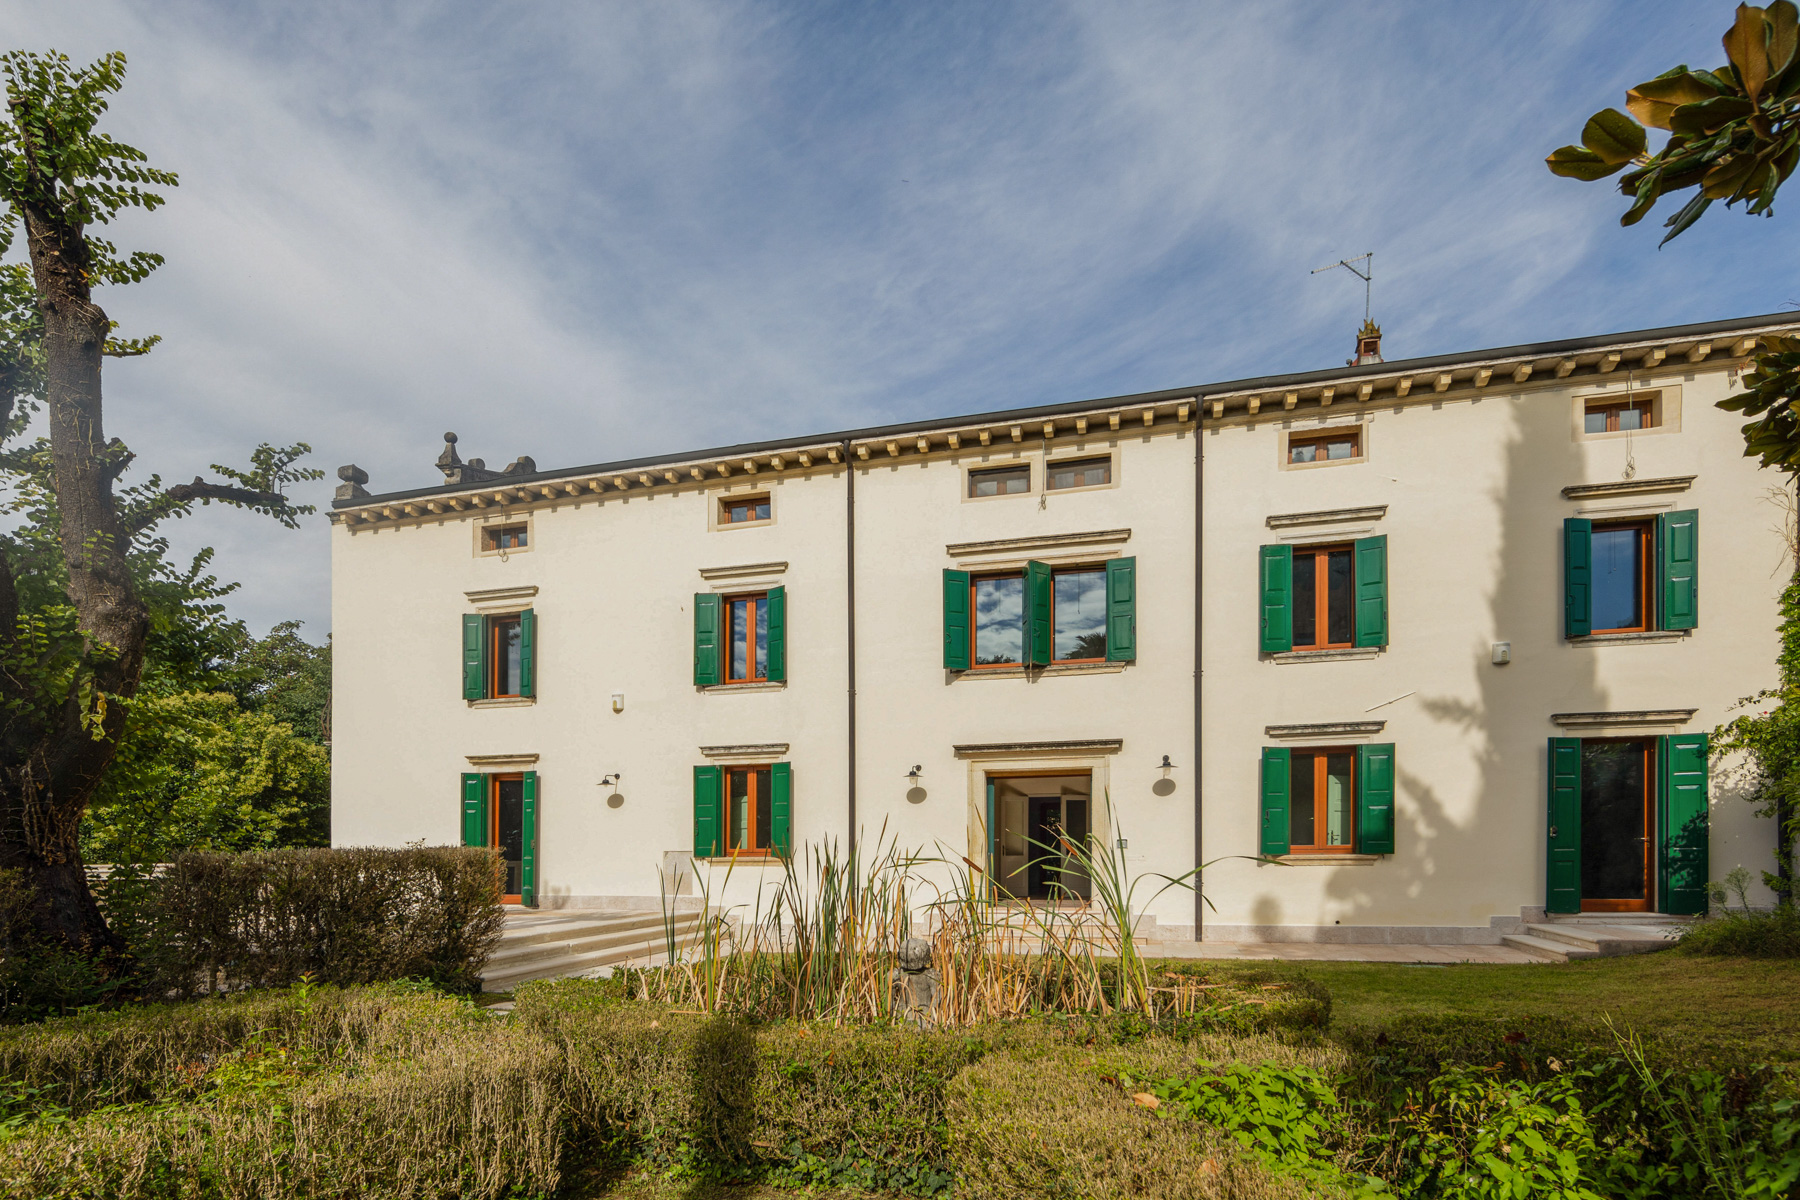 Villa in Vendita a Verona: 5 locali, 890 mq - Foto 4